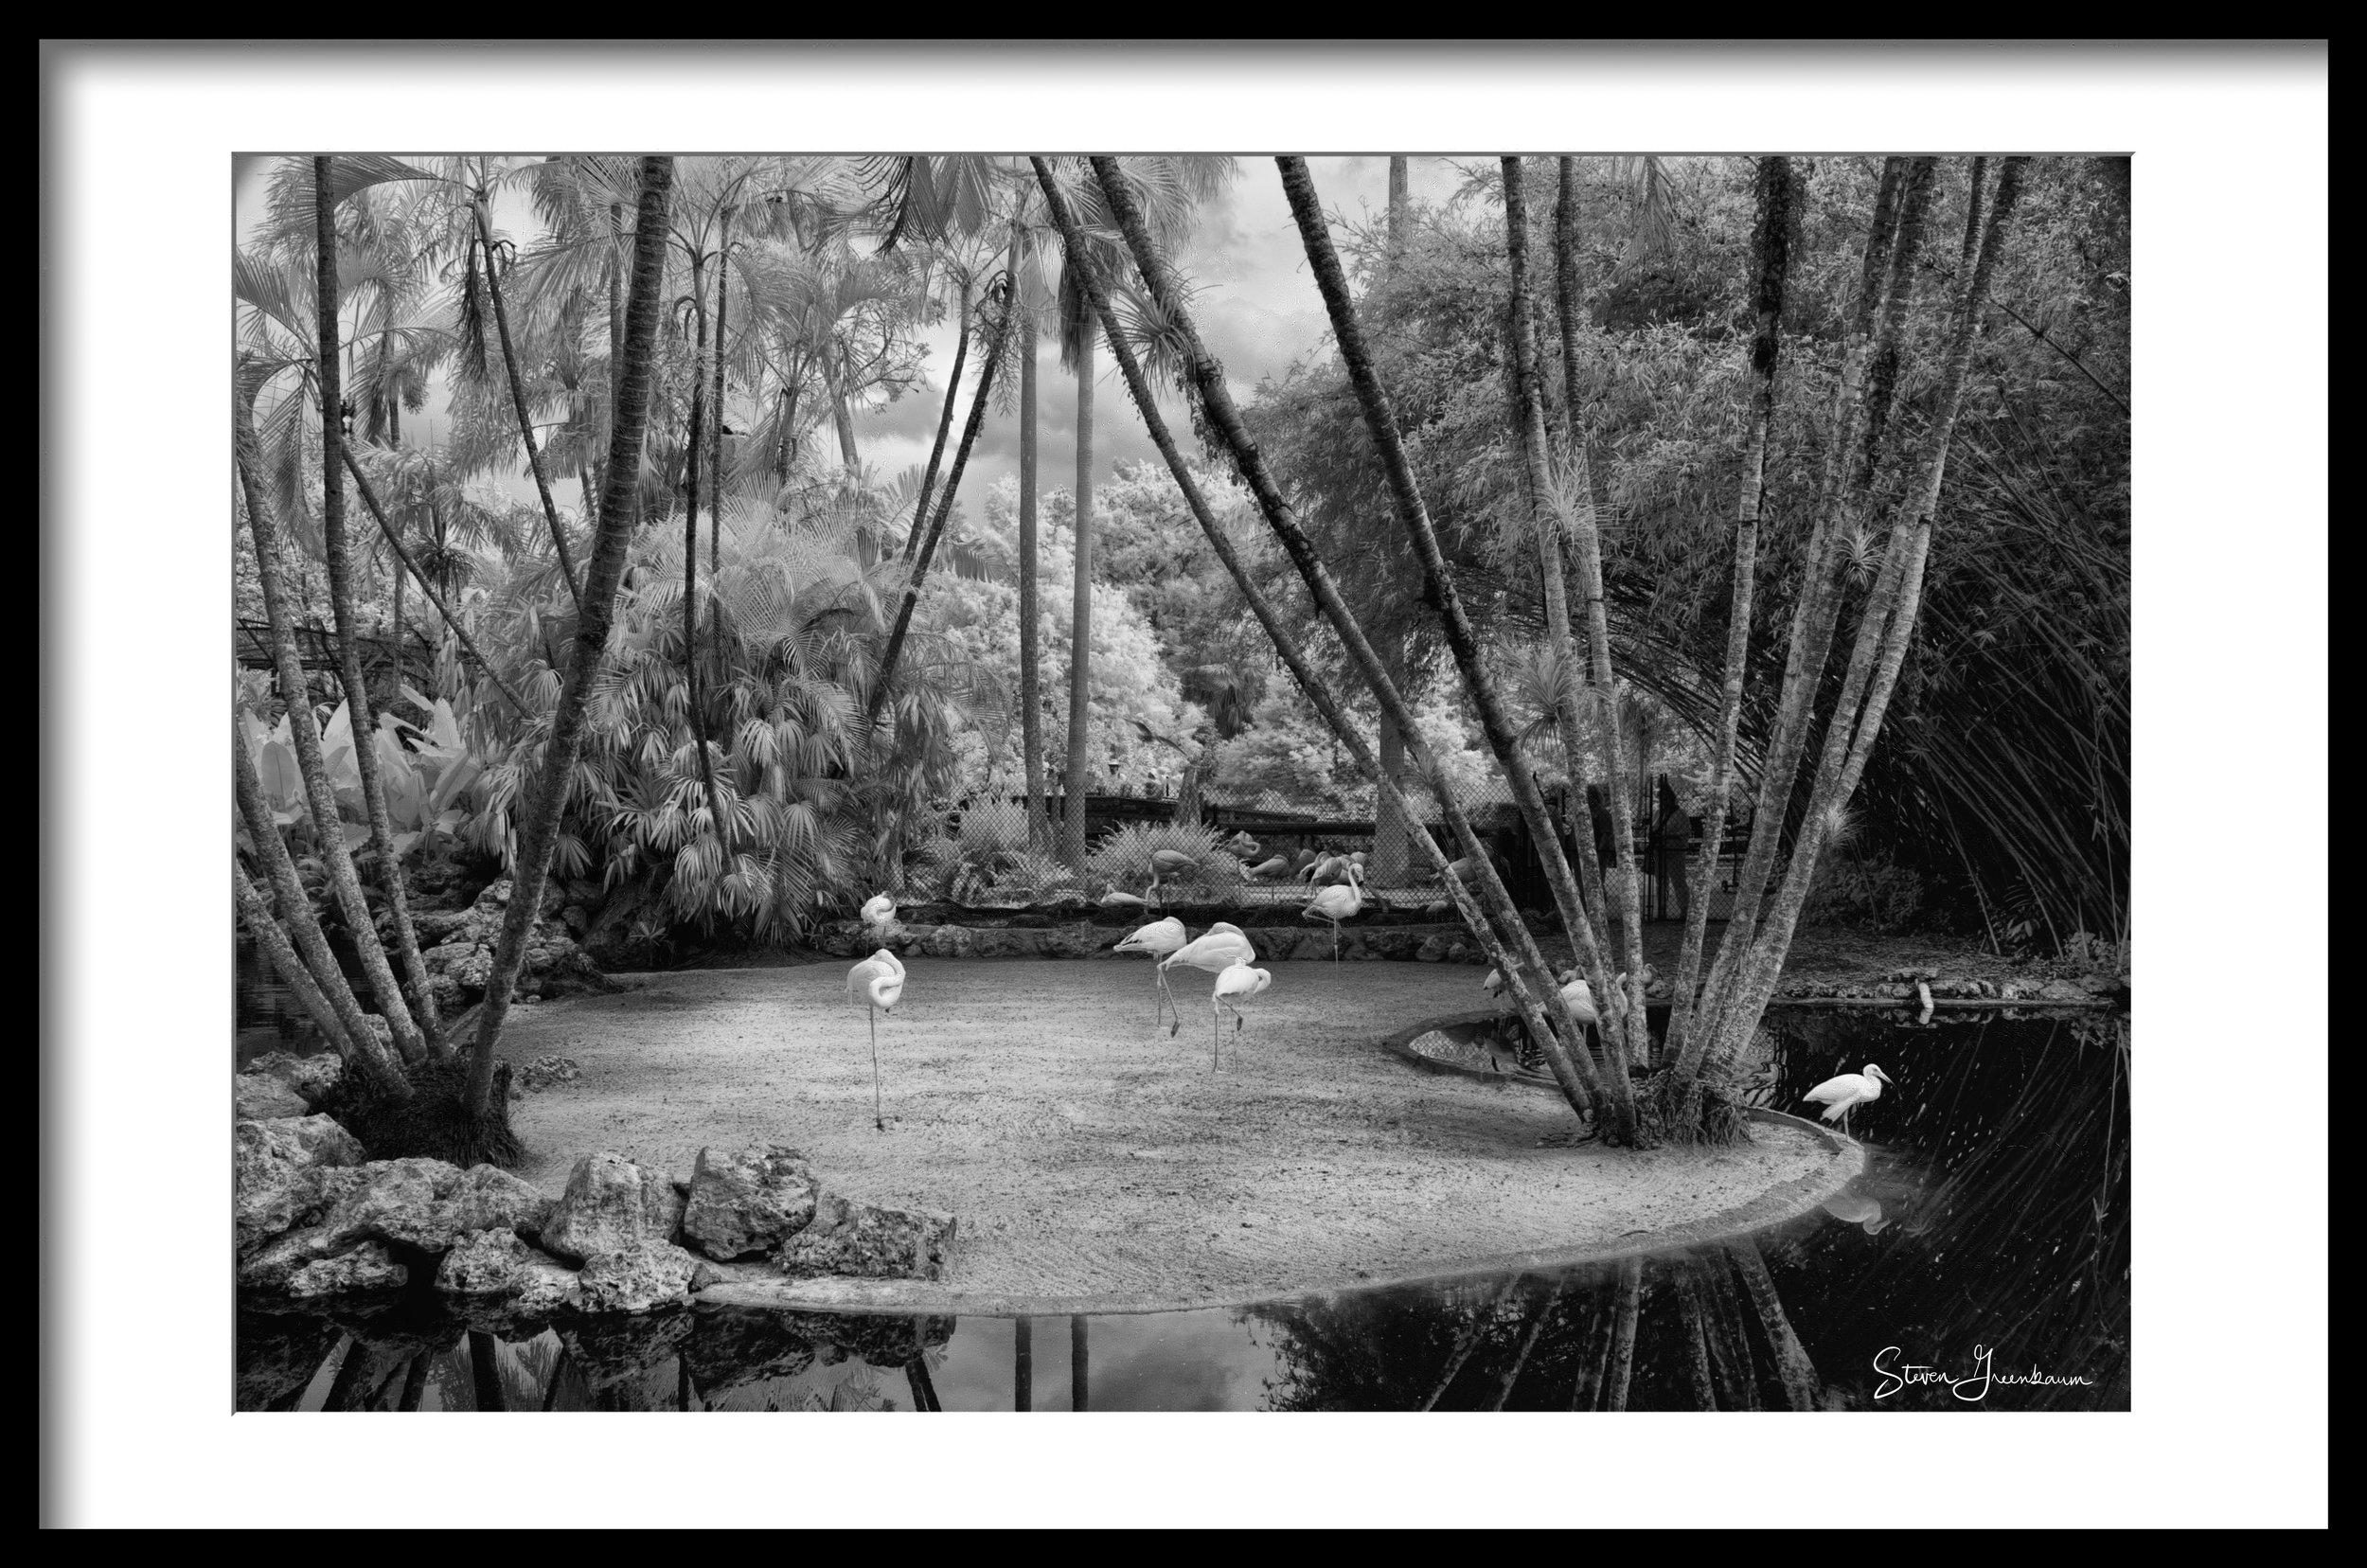 Flamingo Gardens, Davie, FL (infrared) 2018